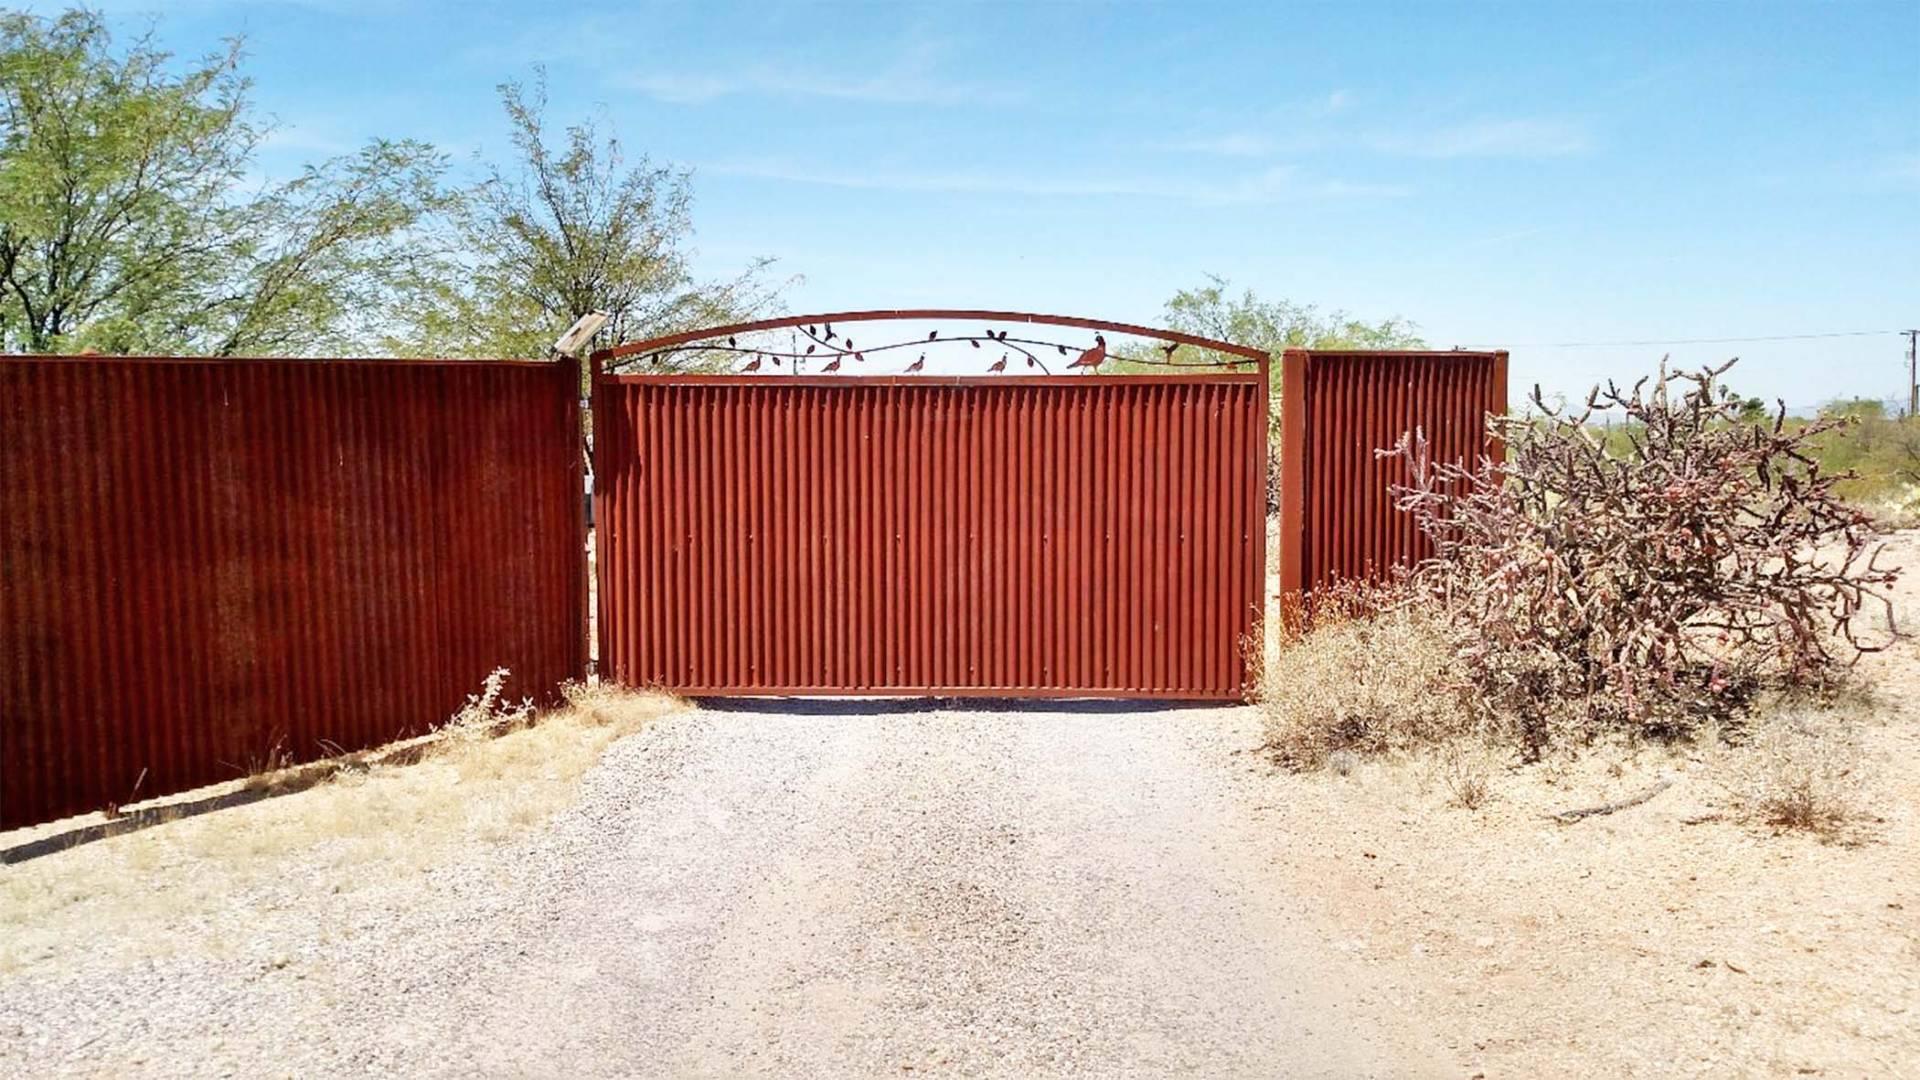 Corrugated Steel Gate | Signature Ironworks | Affordable Fence & Gates | Signature Ironworks | Corrugated Steel Gate | Rusty Corrugated Steel Gate | Natural Rust Corrugated Steel Gate | Arch | Desert Scene | Driveway Gate | Auto Gate | Natural Rust Color